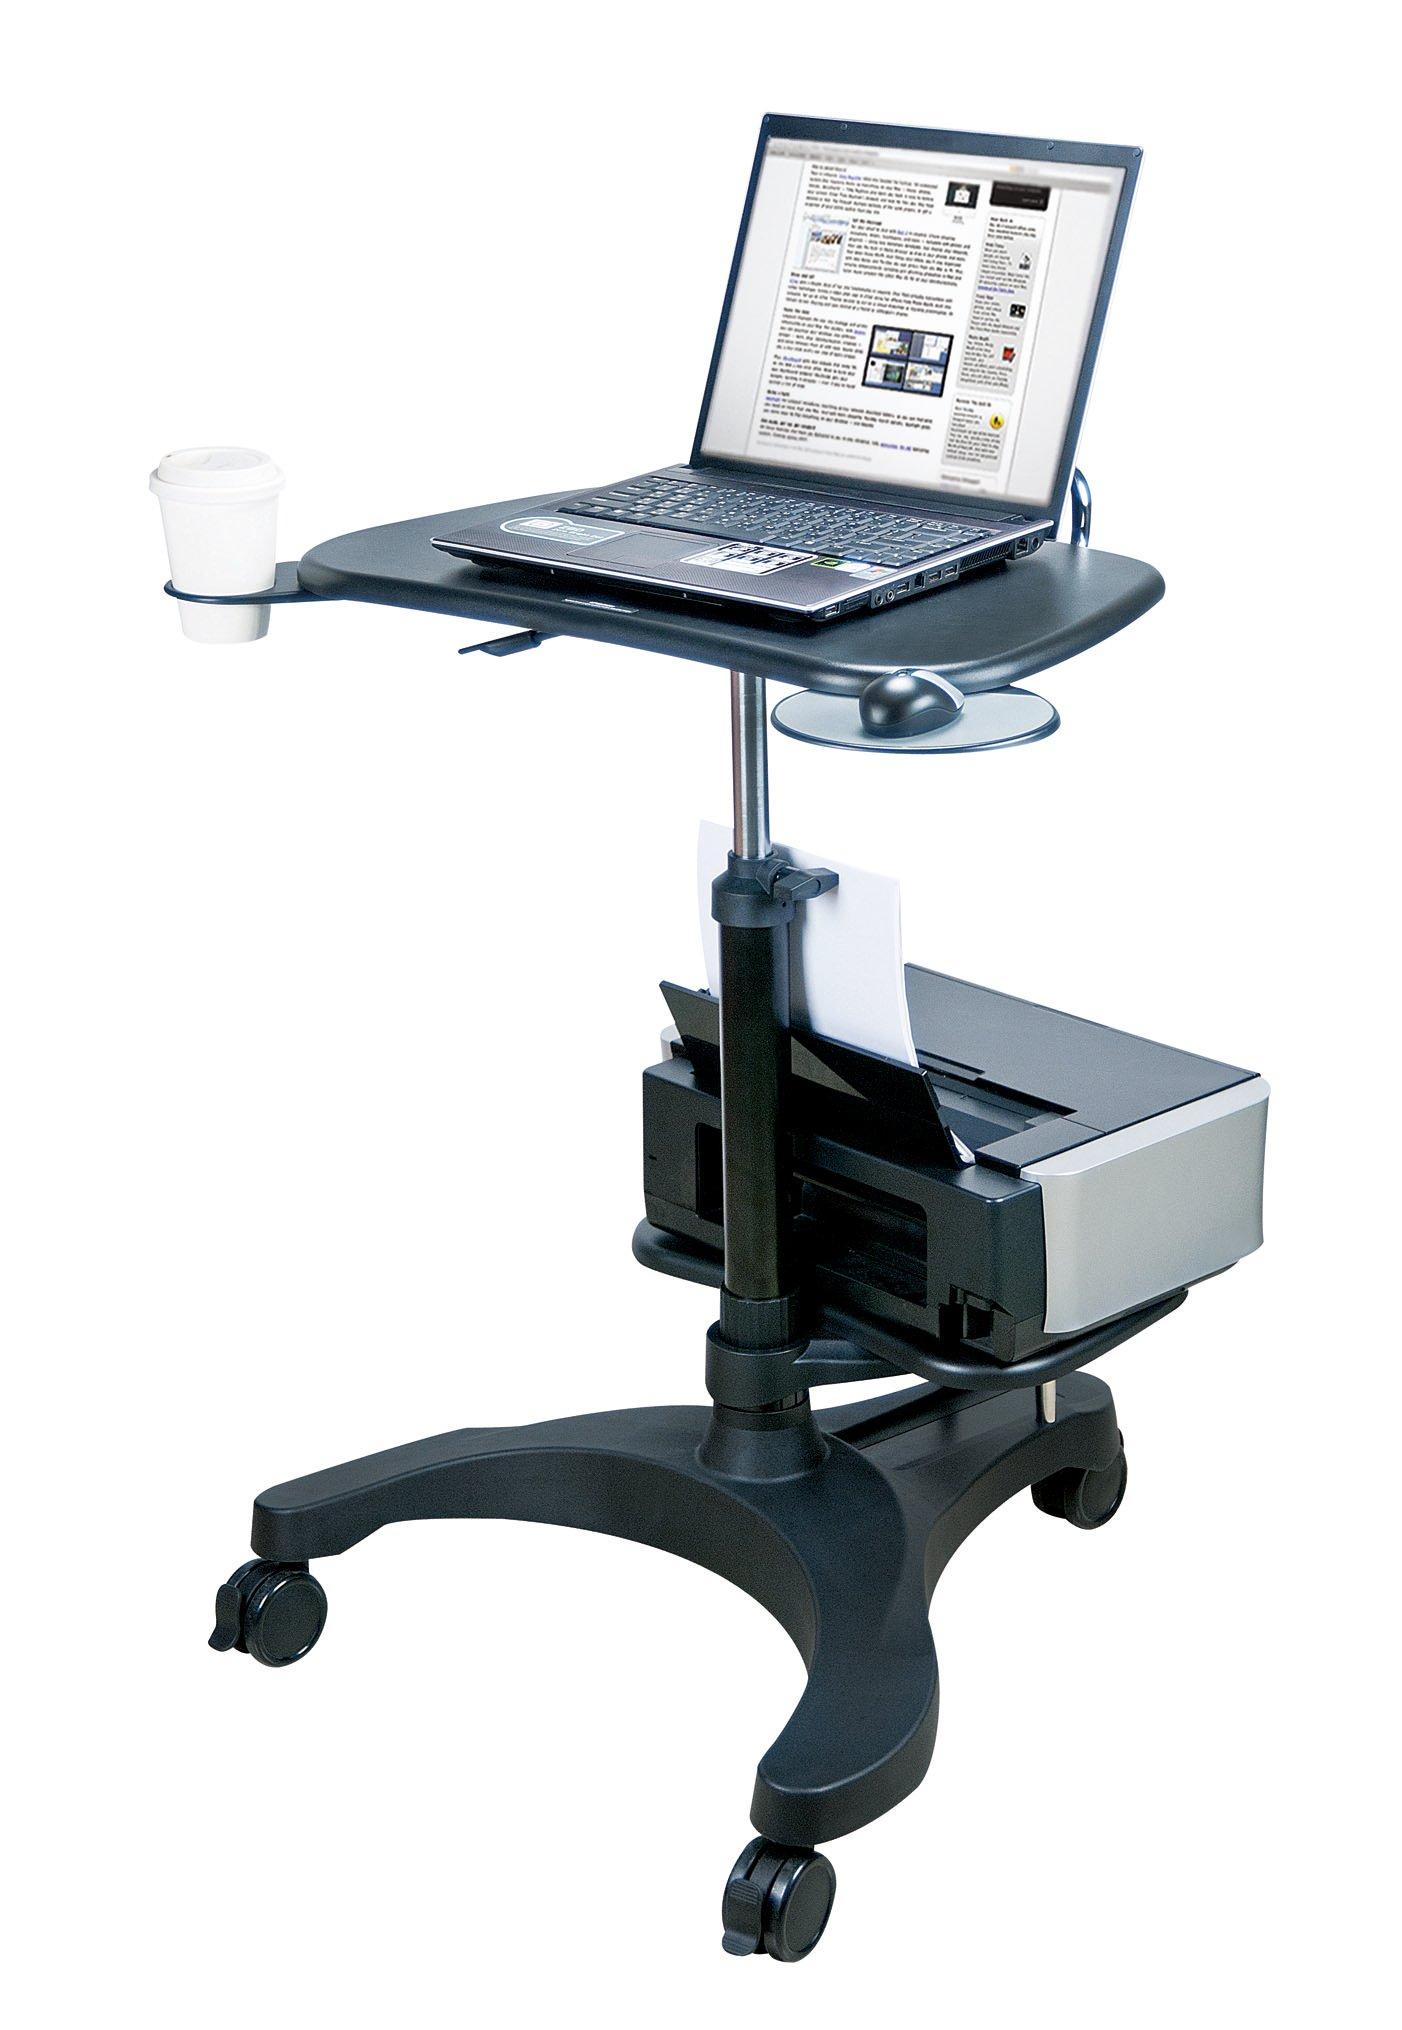 Aidata Ergonomic Sit-Stand Mobile Laptop Cart Work Station with Printer Shelf (Model: LPD009P)